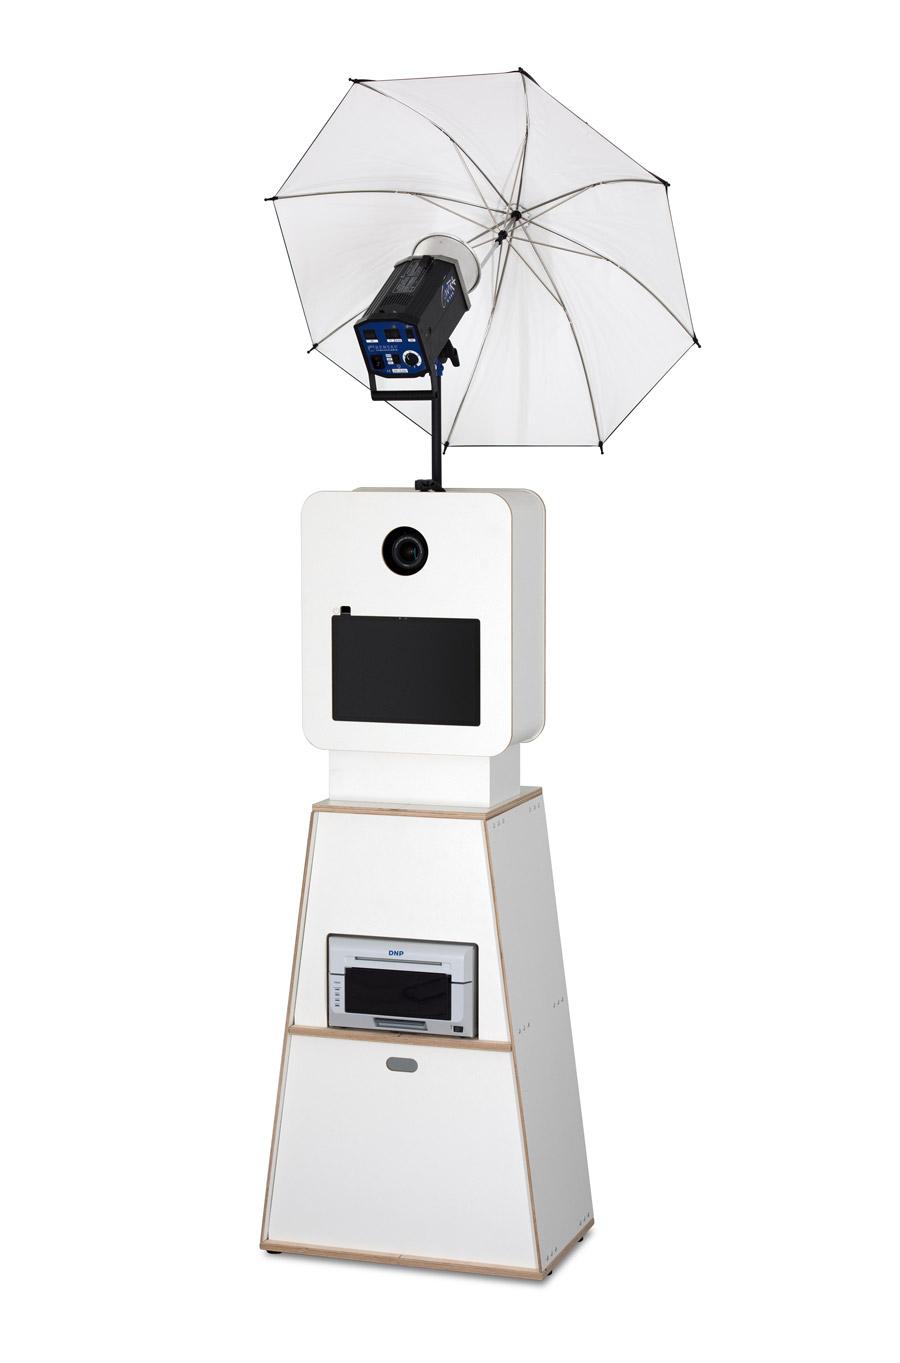 fotobox mieten i eventverleih dresden. Black Bedroom Furniture Sets. Home Design Ideas